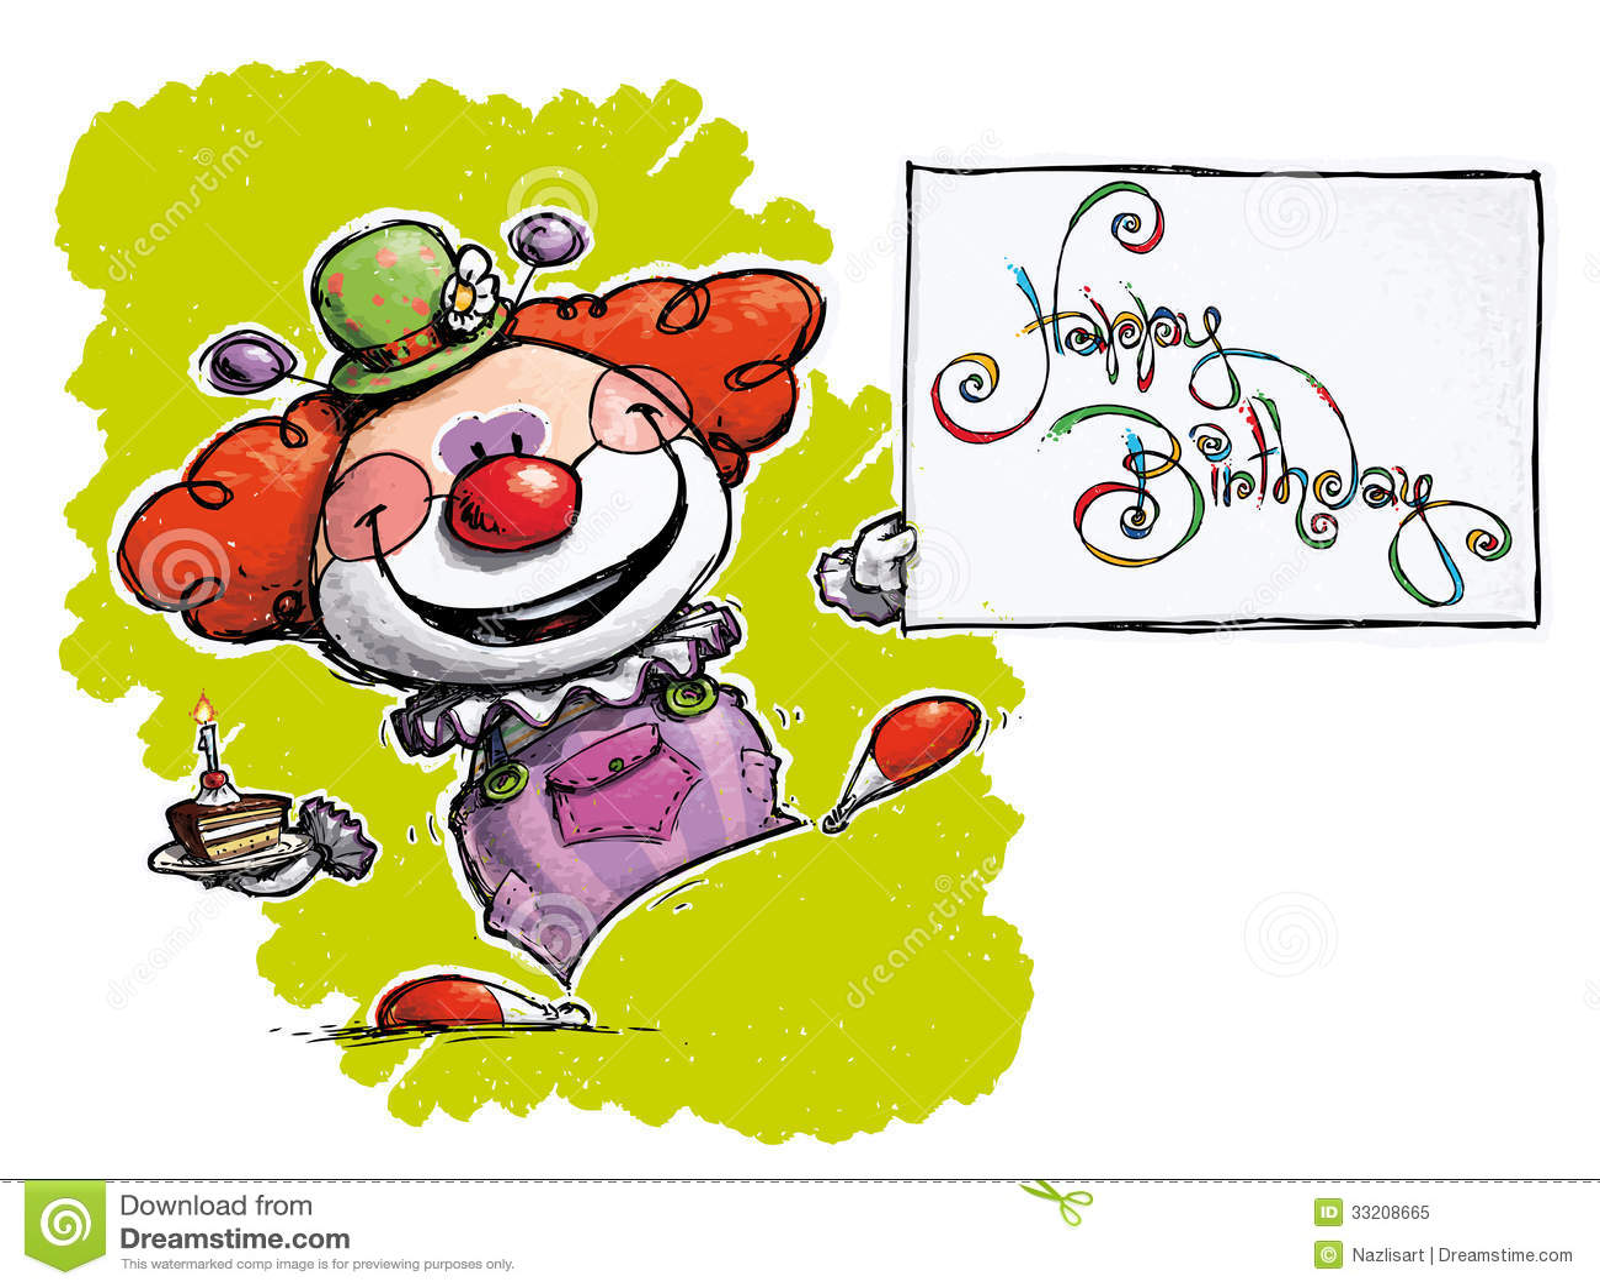 Clown Holding A Happy Birthday Card Royalty Free Photo – Clown Birthday Cards